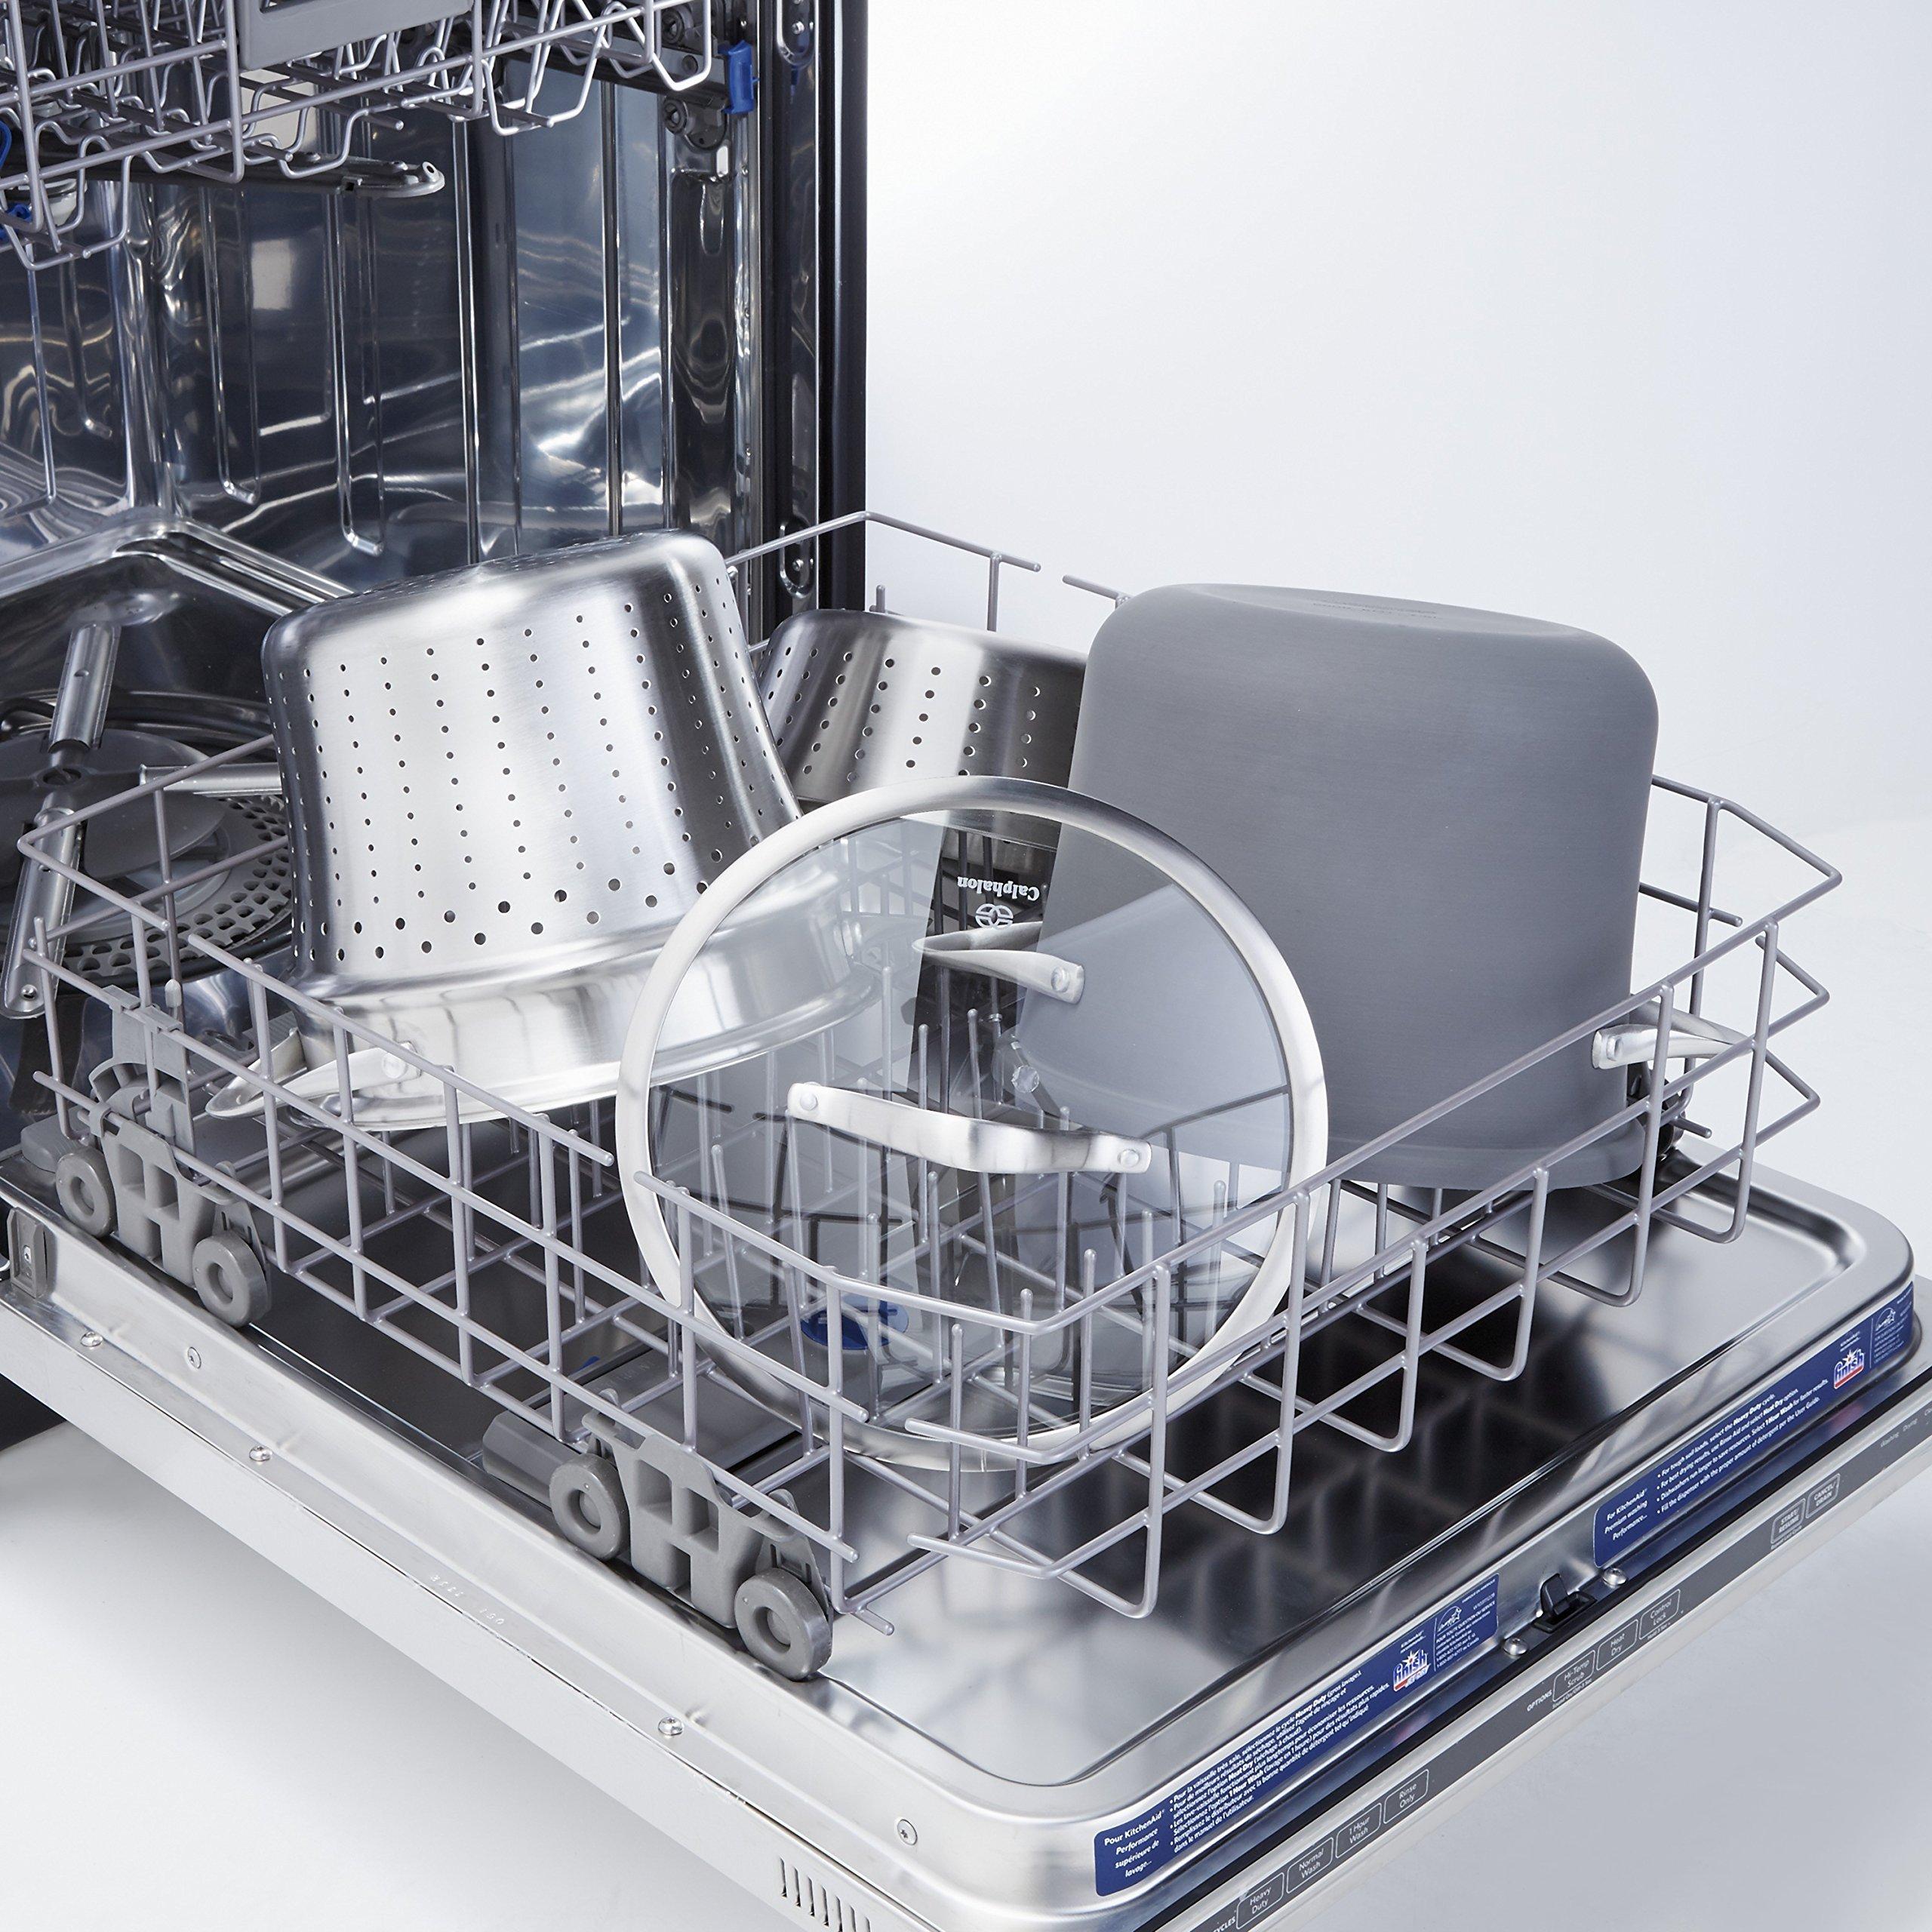 Calphalon Contemporary Hard-Anodized Aluminum Nonstick Cookware, Pasta Pot with Steamer Insert, 8-quart, Black by Calphalon (Image #3)